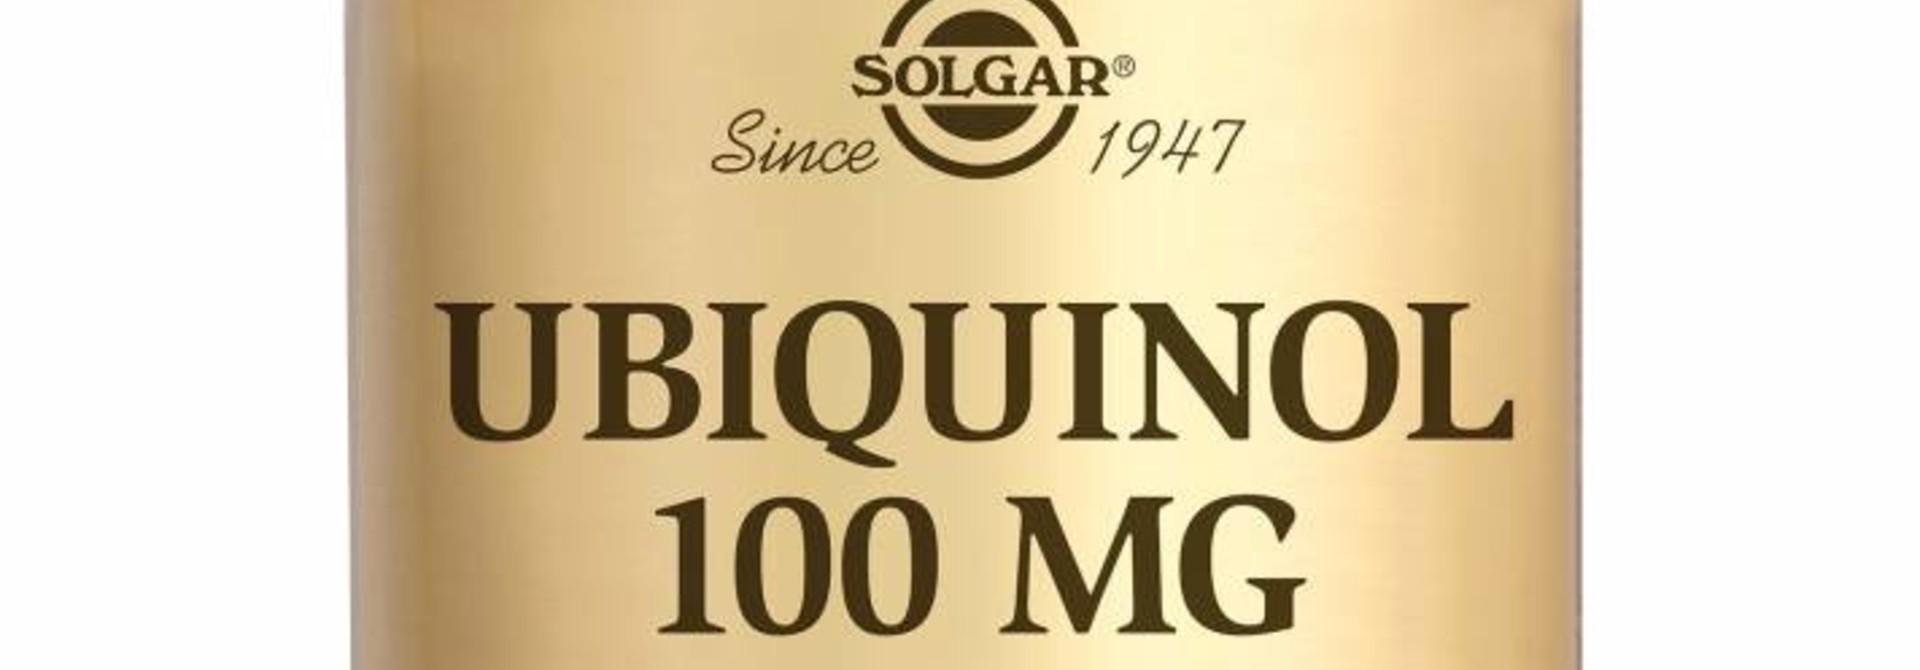 Ubiquinol 100 mg 50 softgels